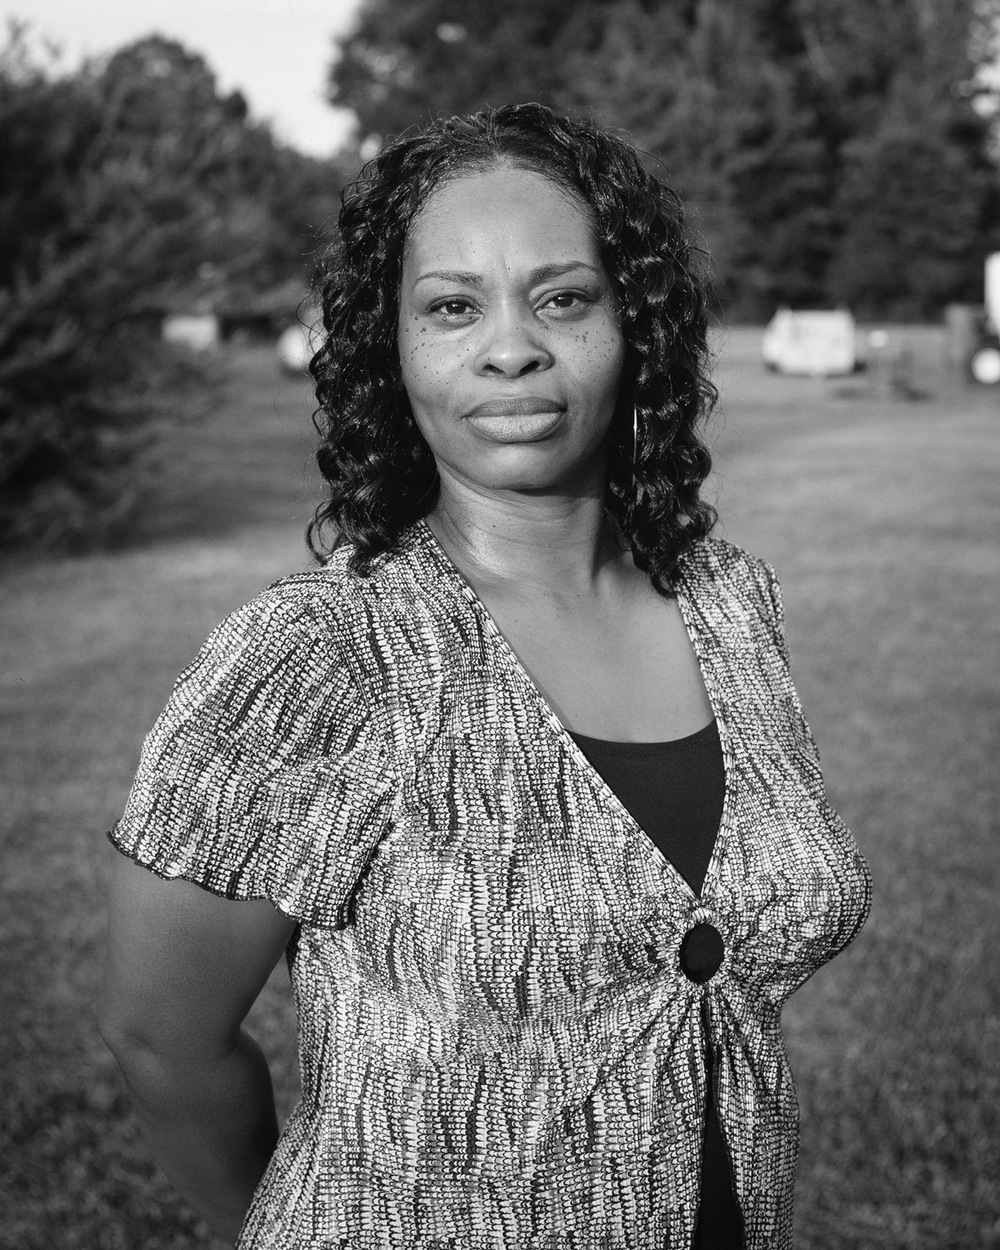 Angela, Montgomery, Alabama,2009